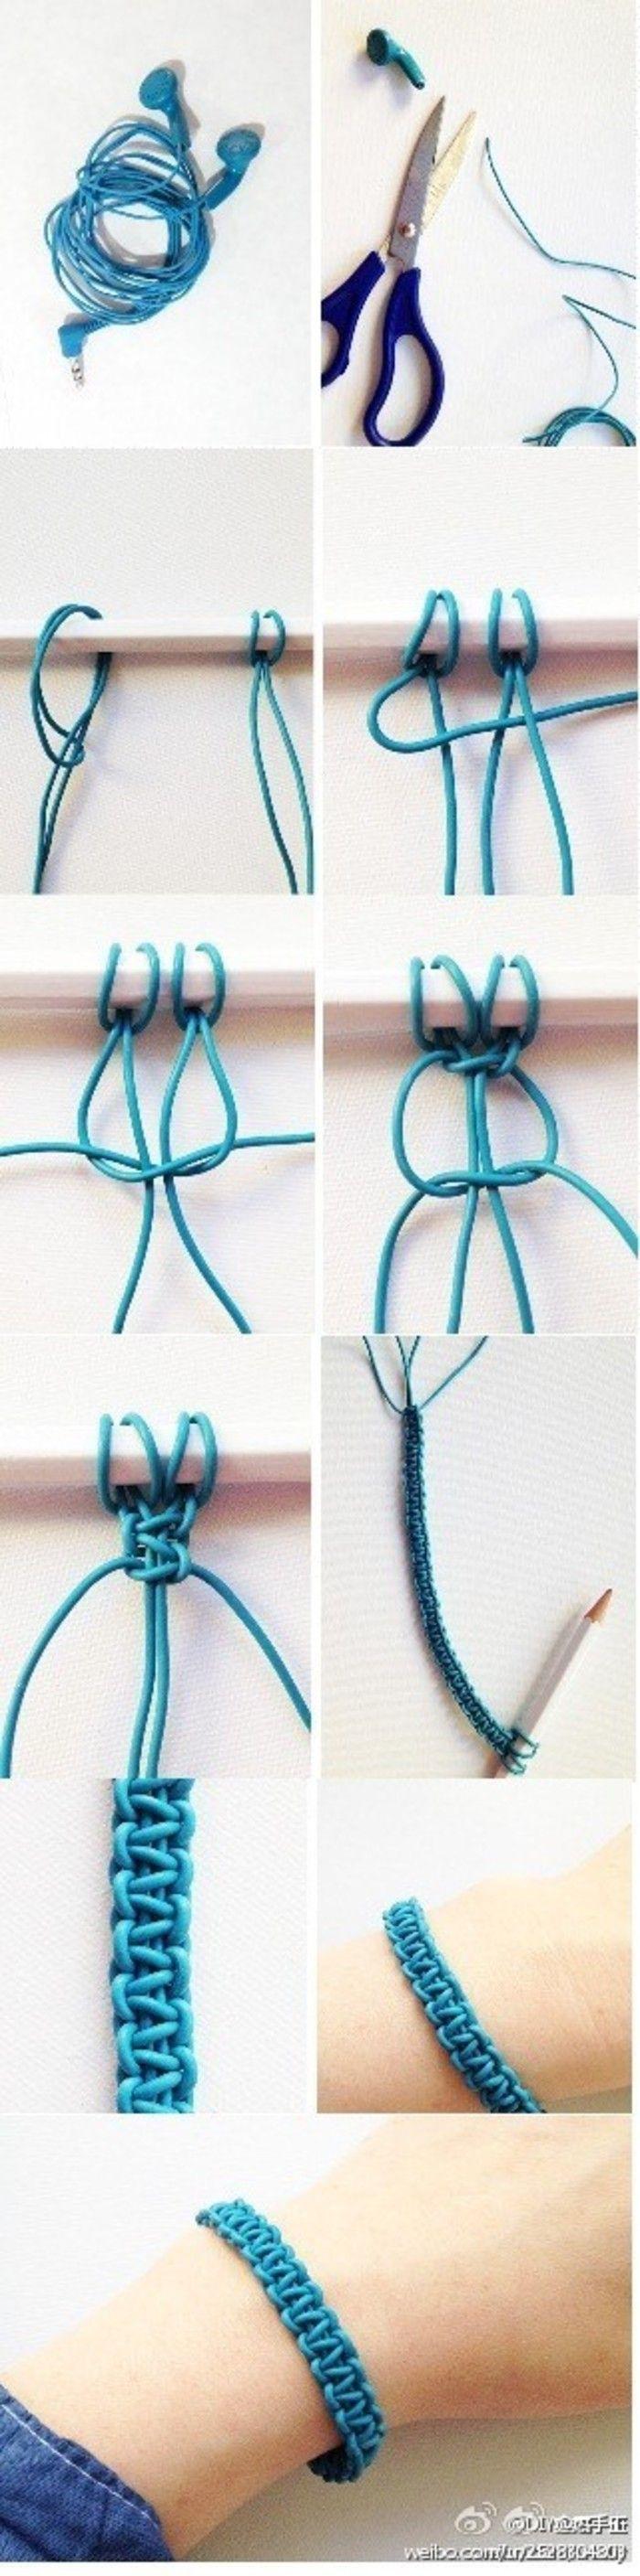 DIY Bracelet From Headphone Wires